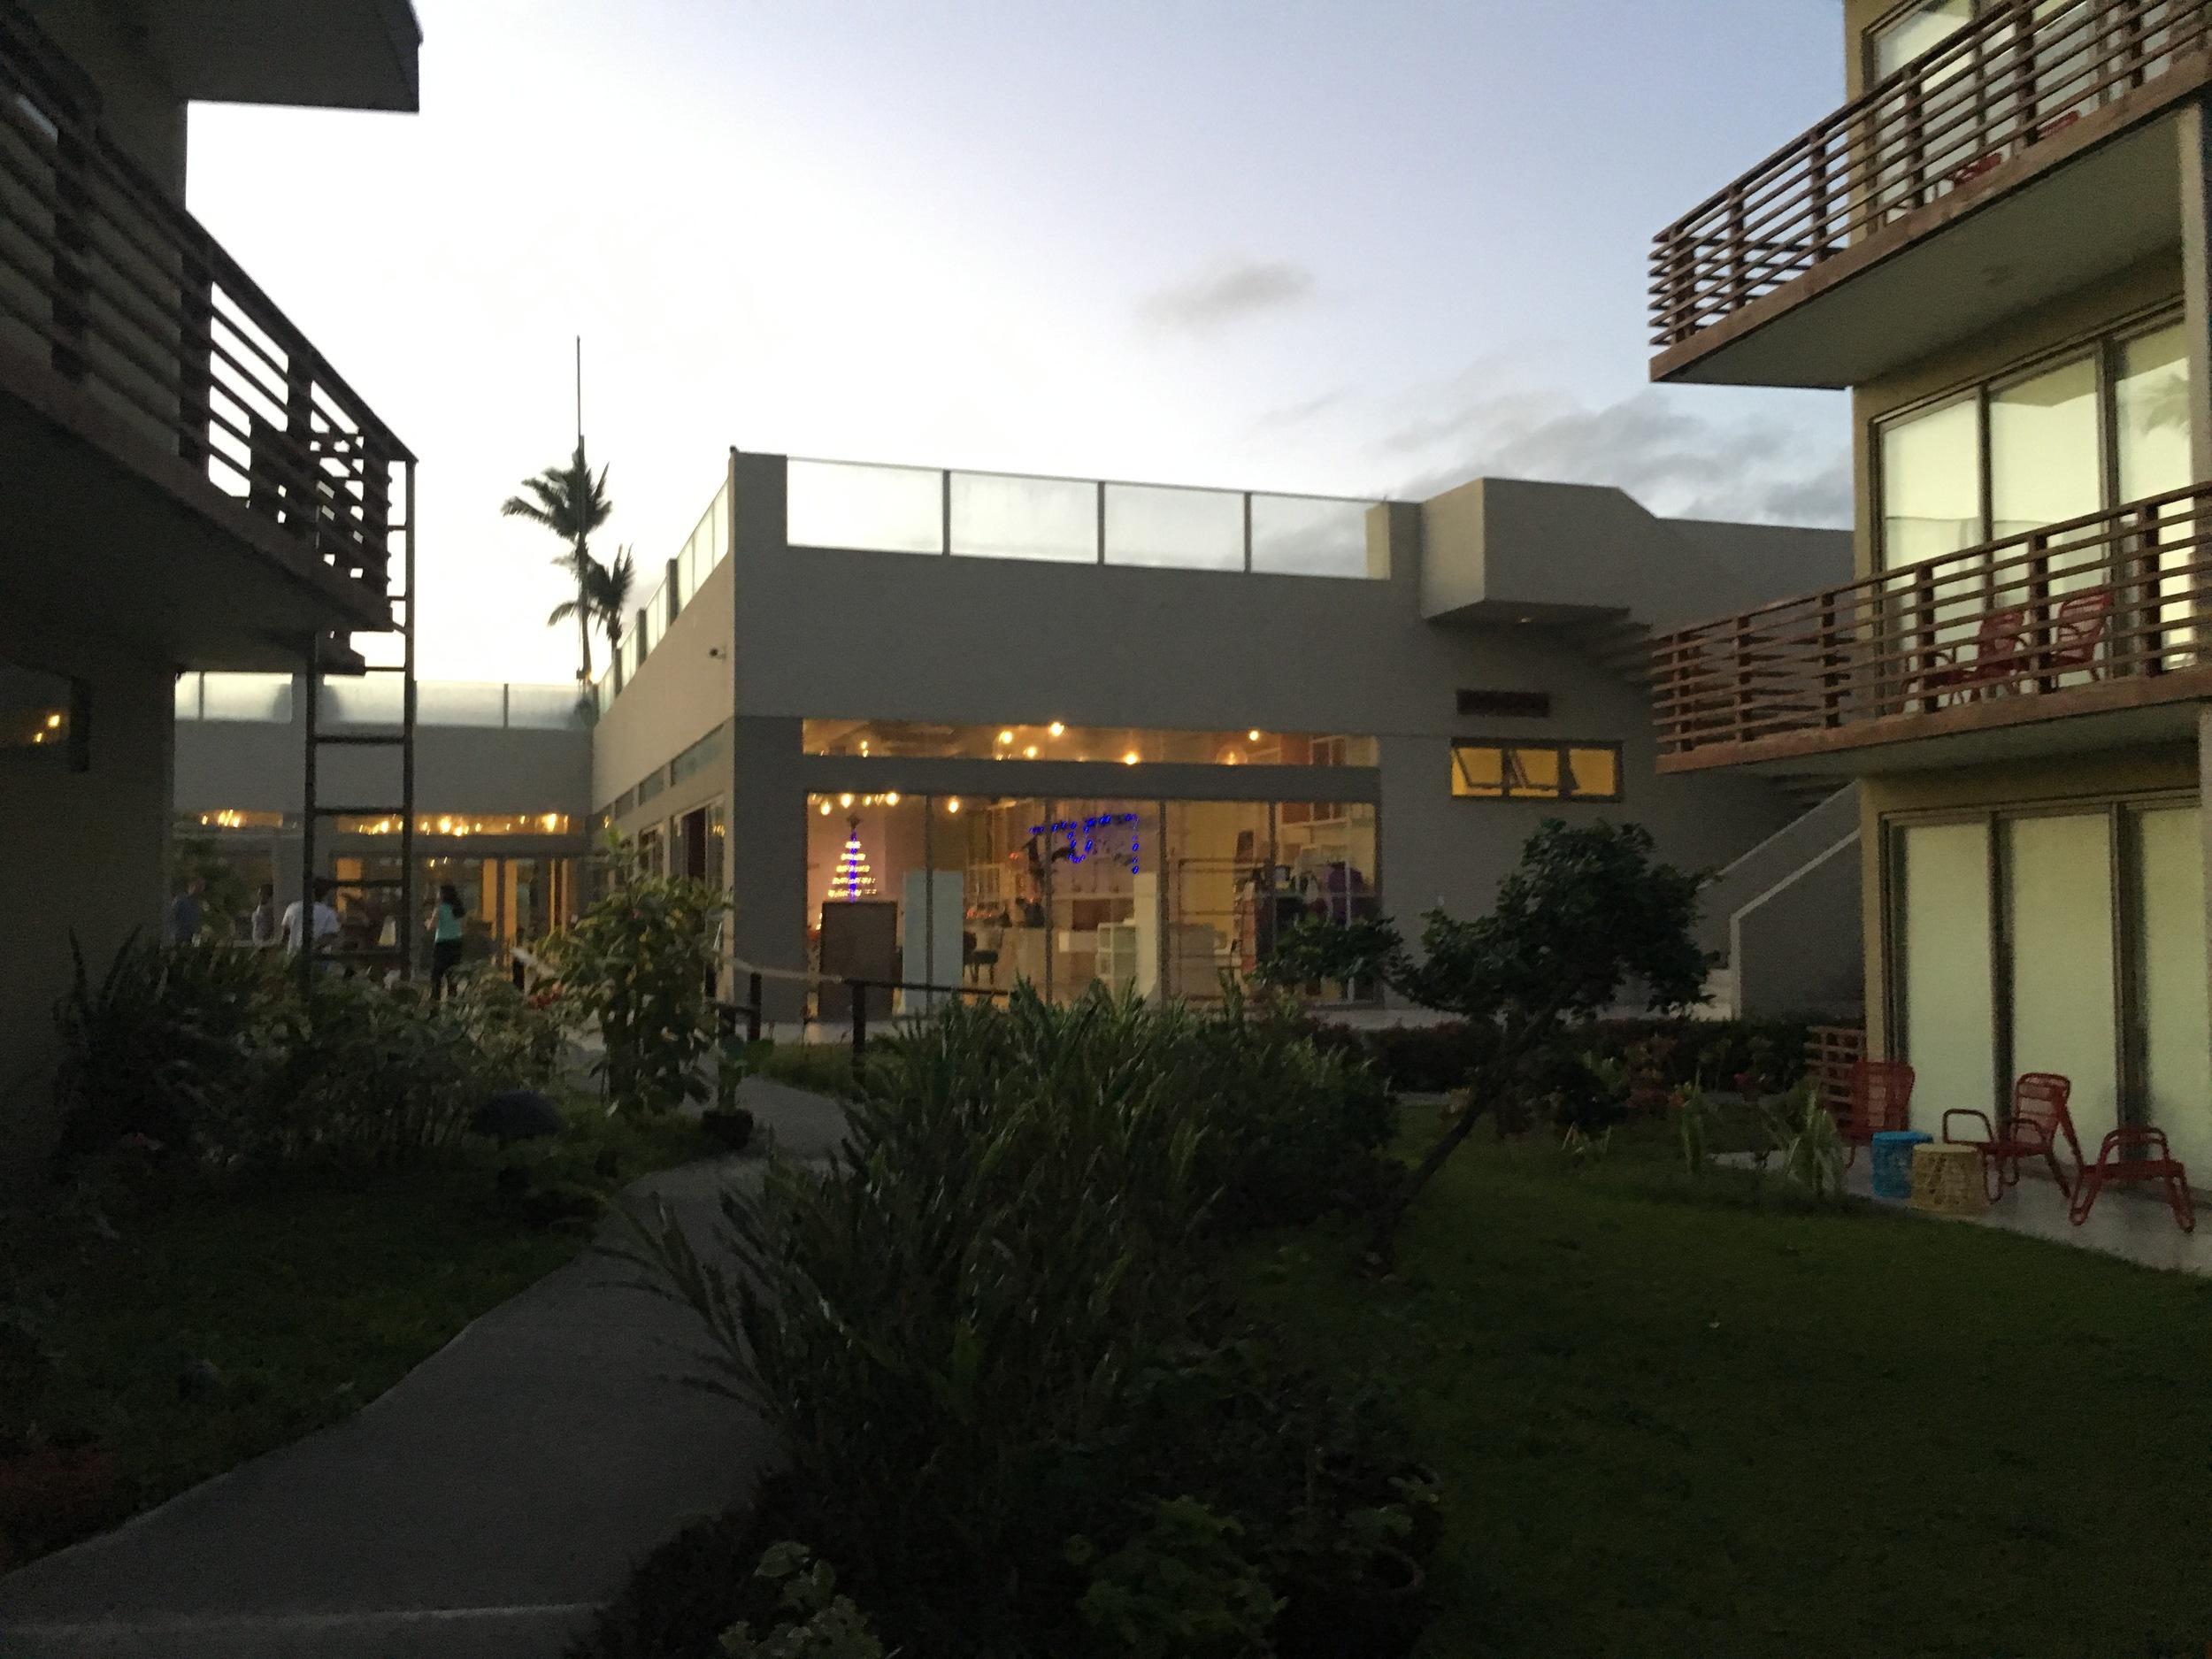 illumelation.com   Exterior at Sunset. Costa Pacifica Resort, Baler. Review.